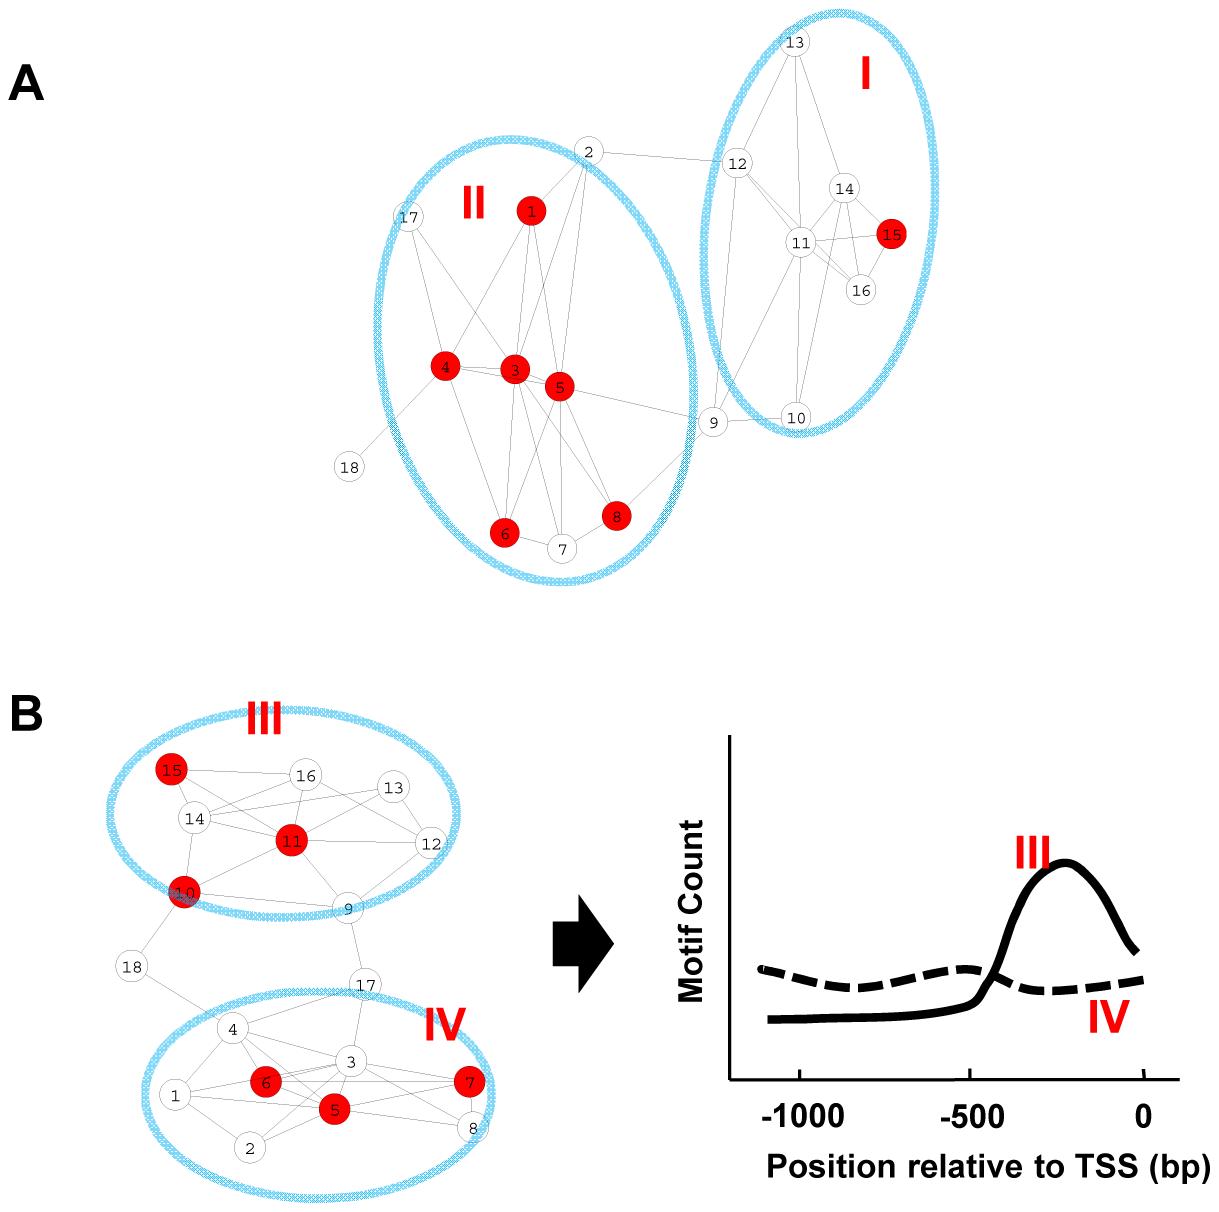 Motif enrichment and motif position bias analysis.